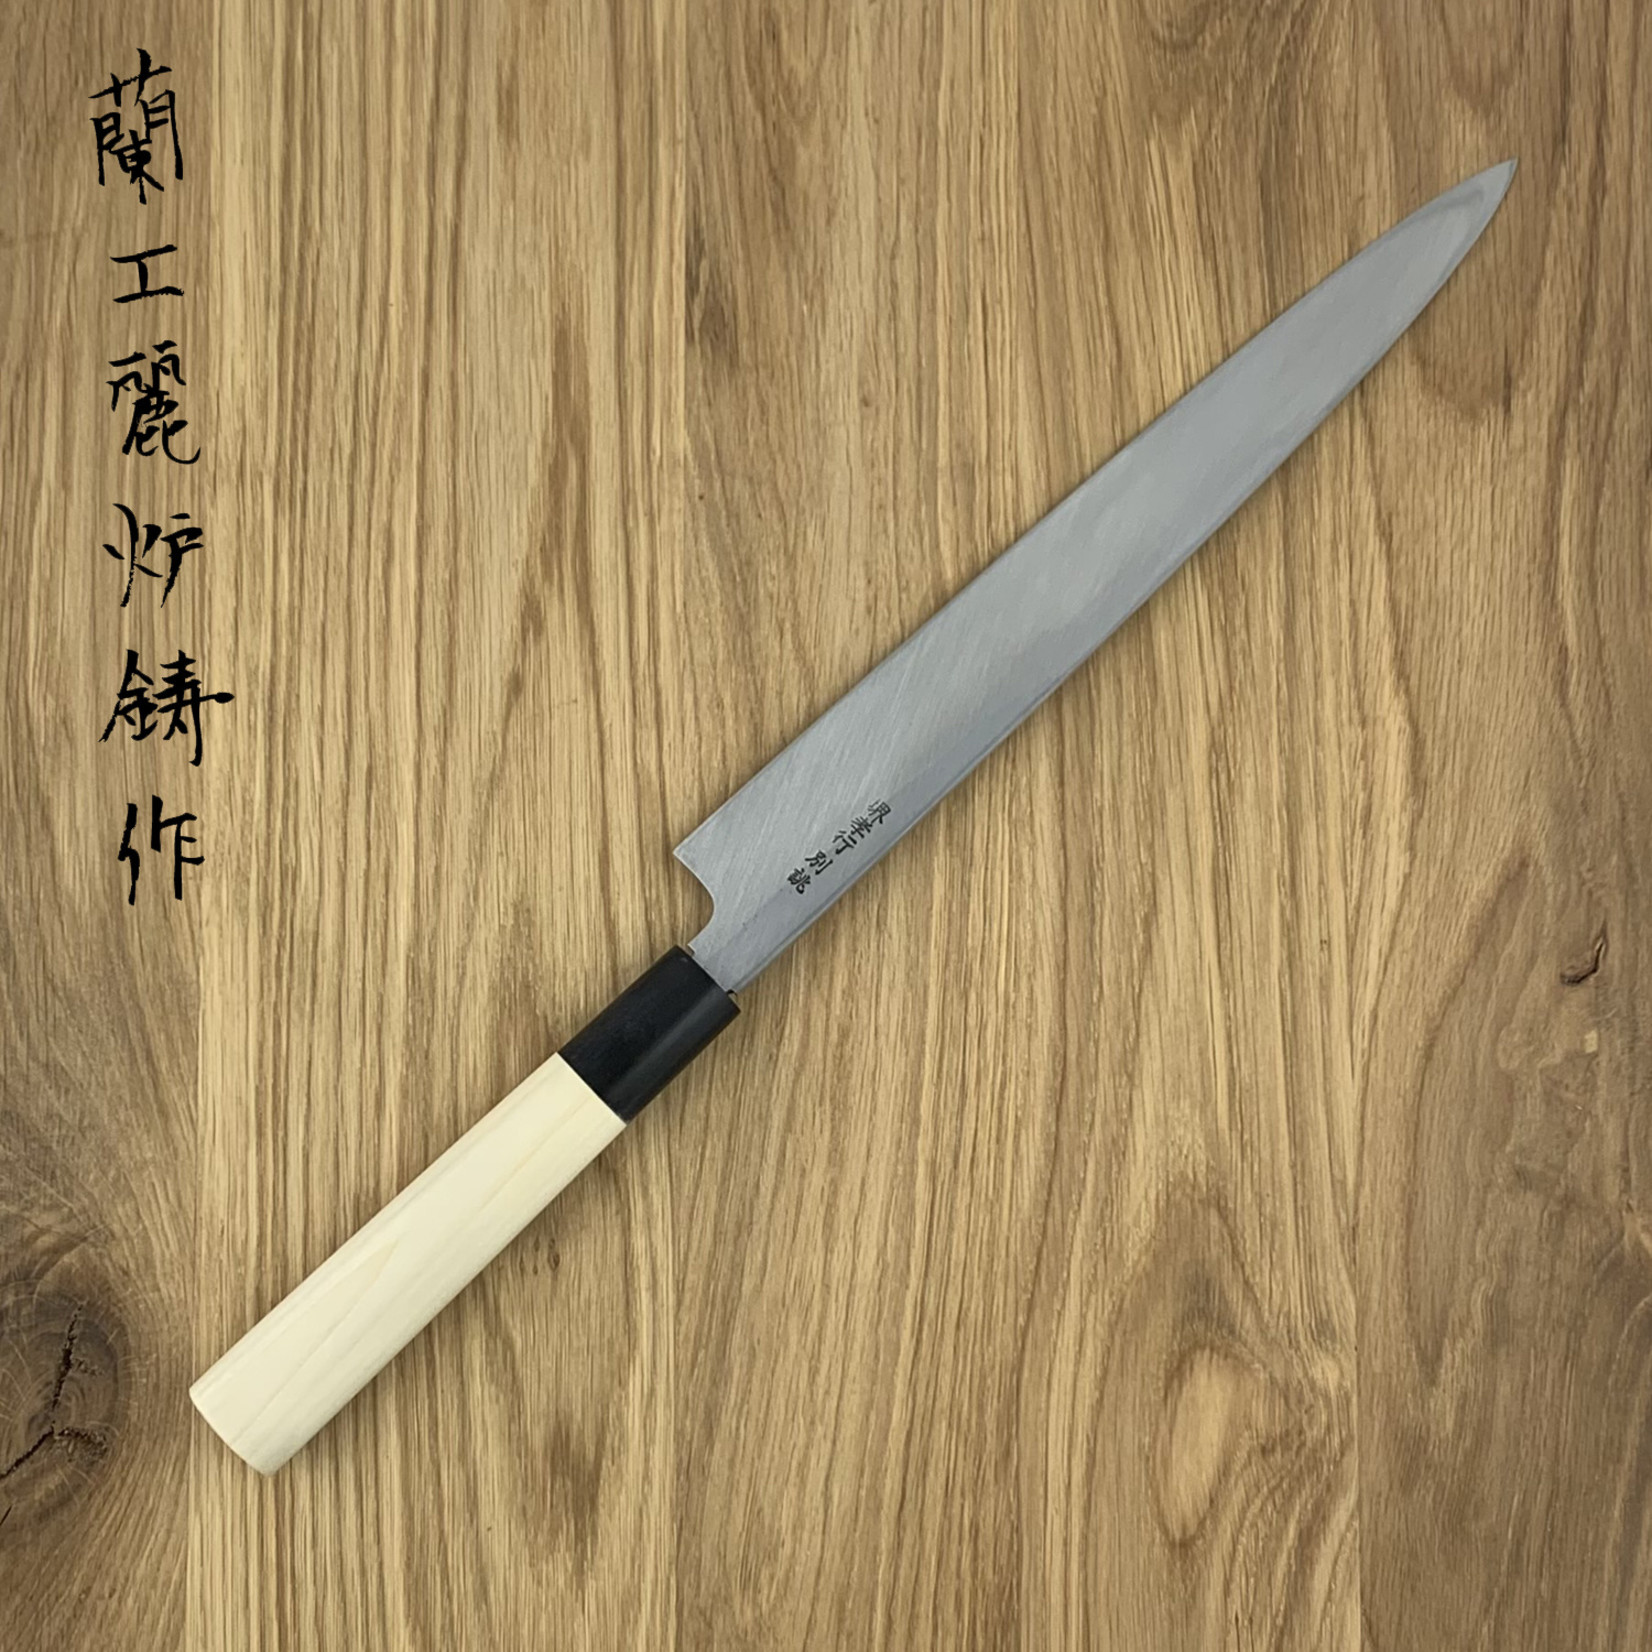 SAKAI TAKAYUKI Tokujou White #2 Magnolia yanagiba 210 mm 03002